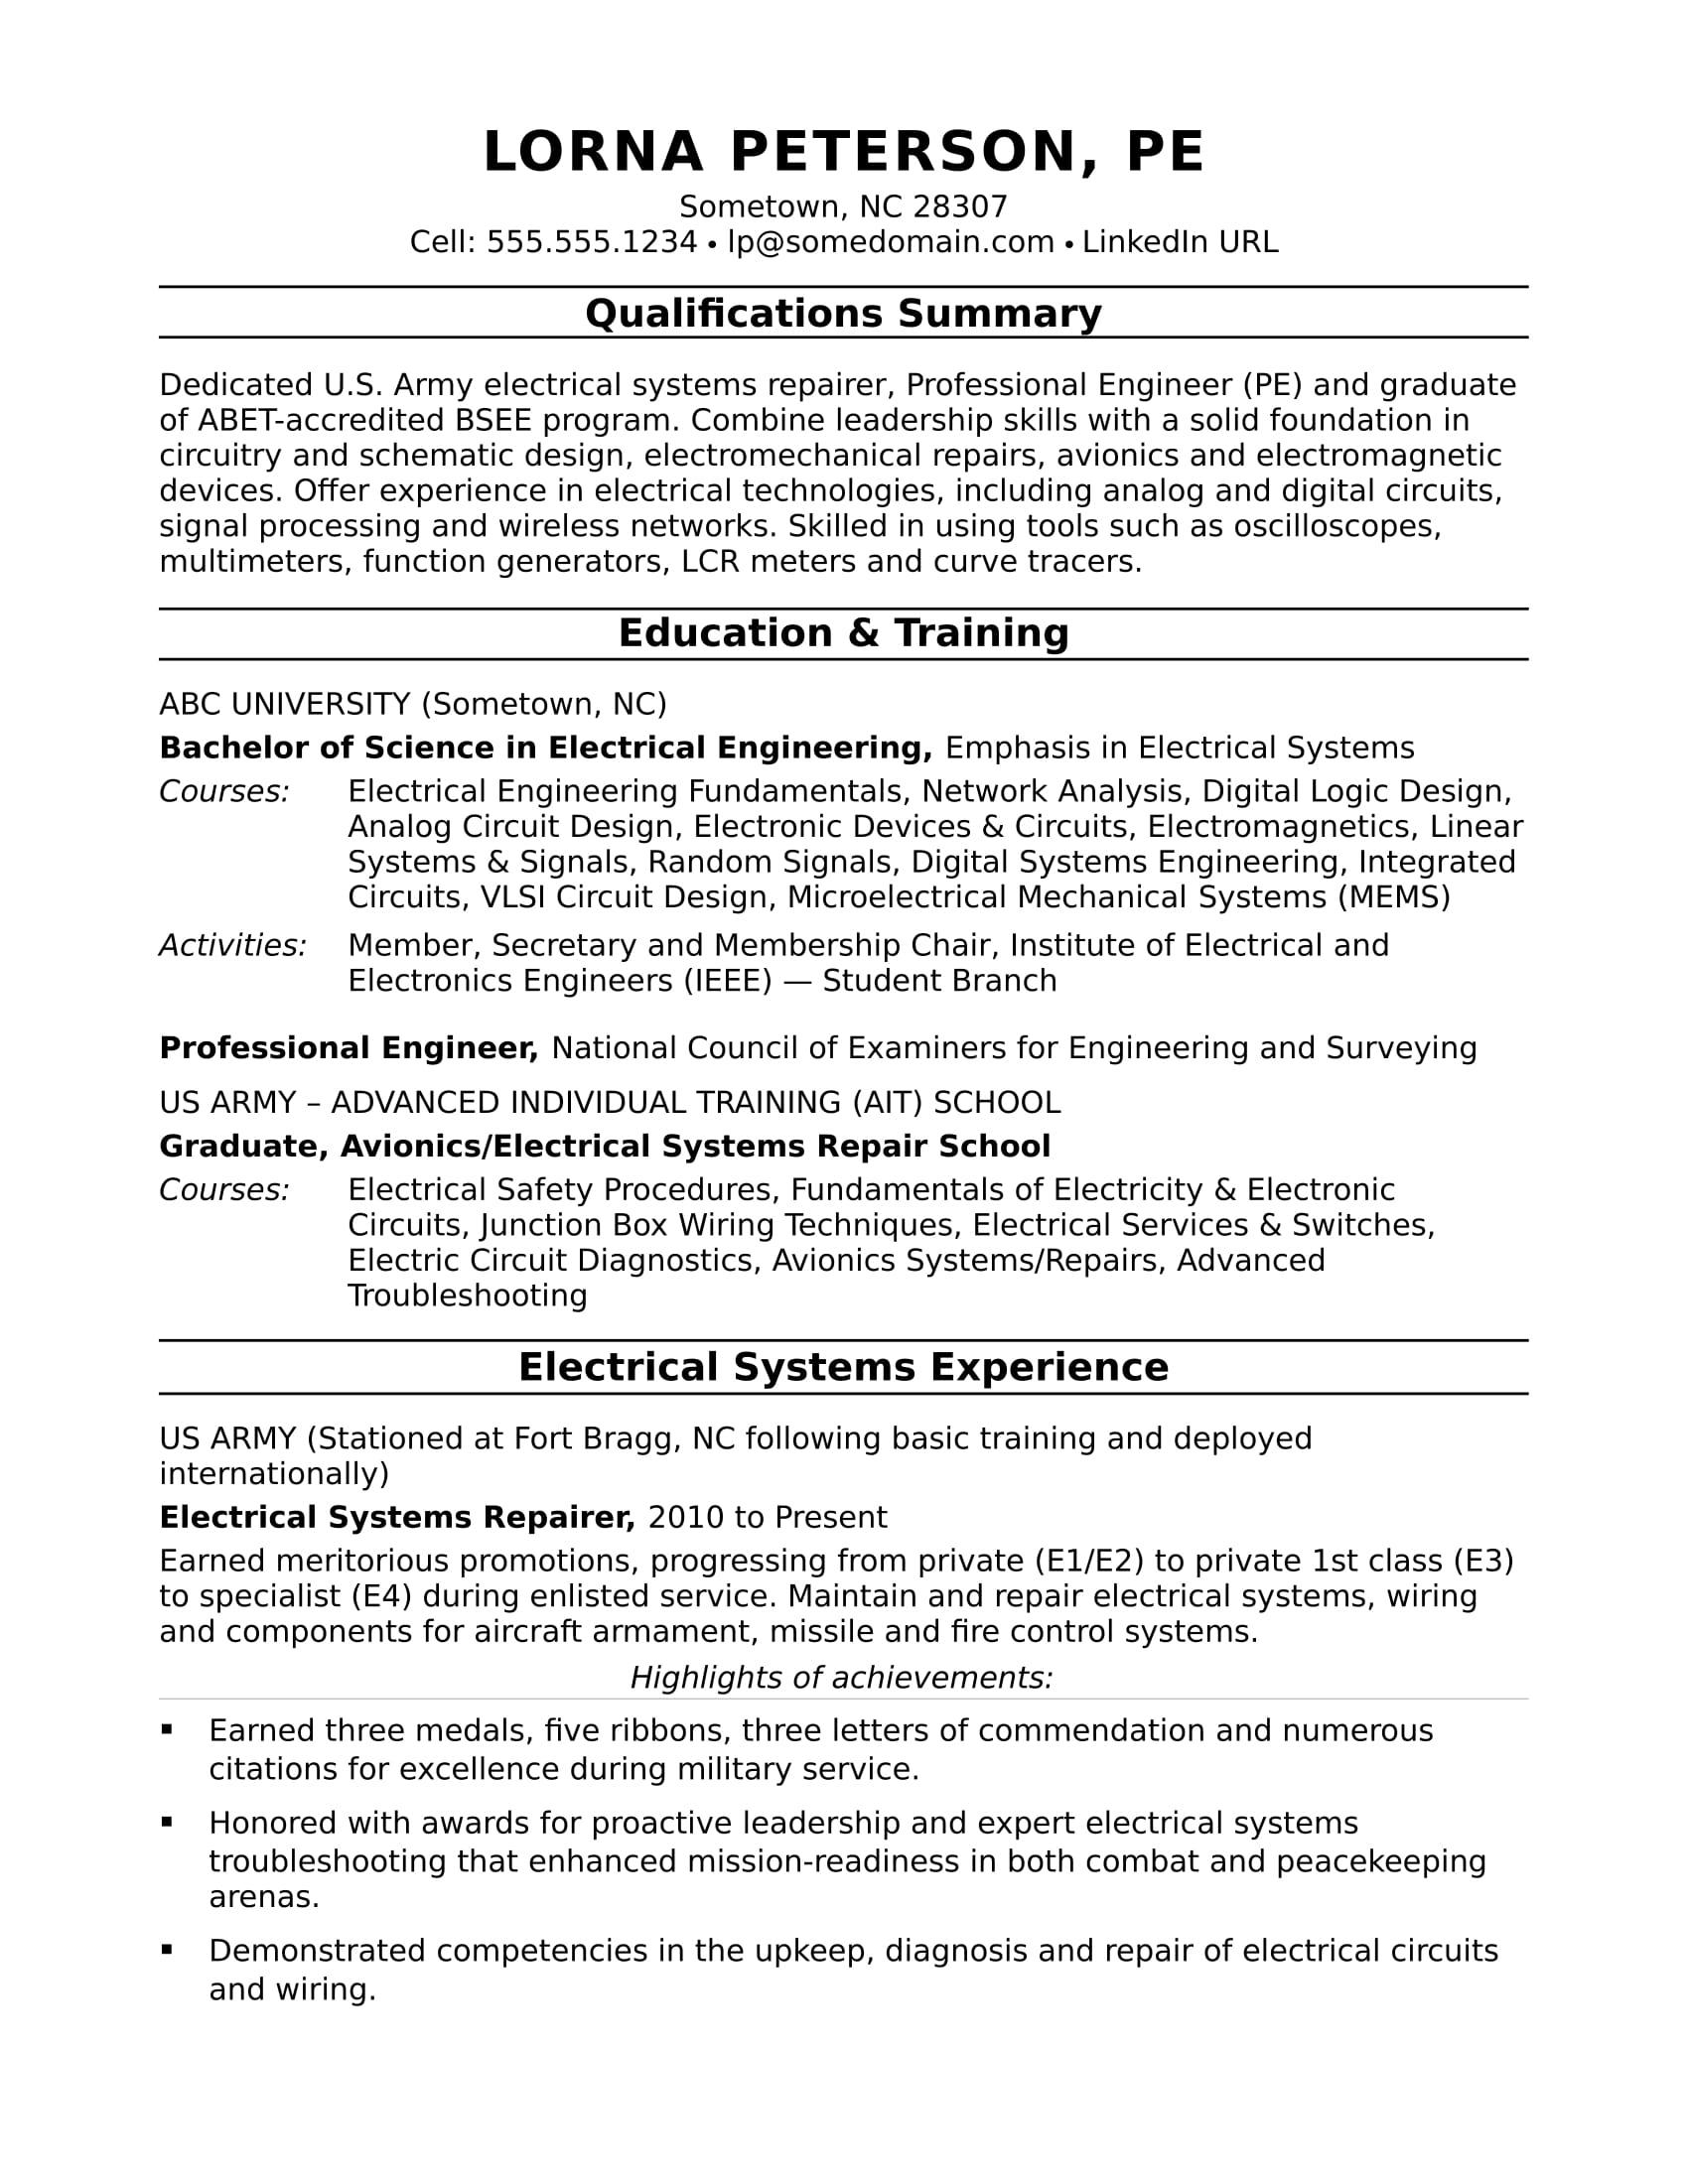 Sample Resume for a Midlevel Electrical Engineer  Monstercom